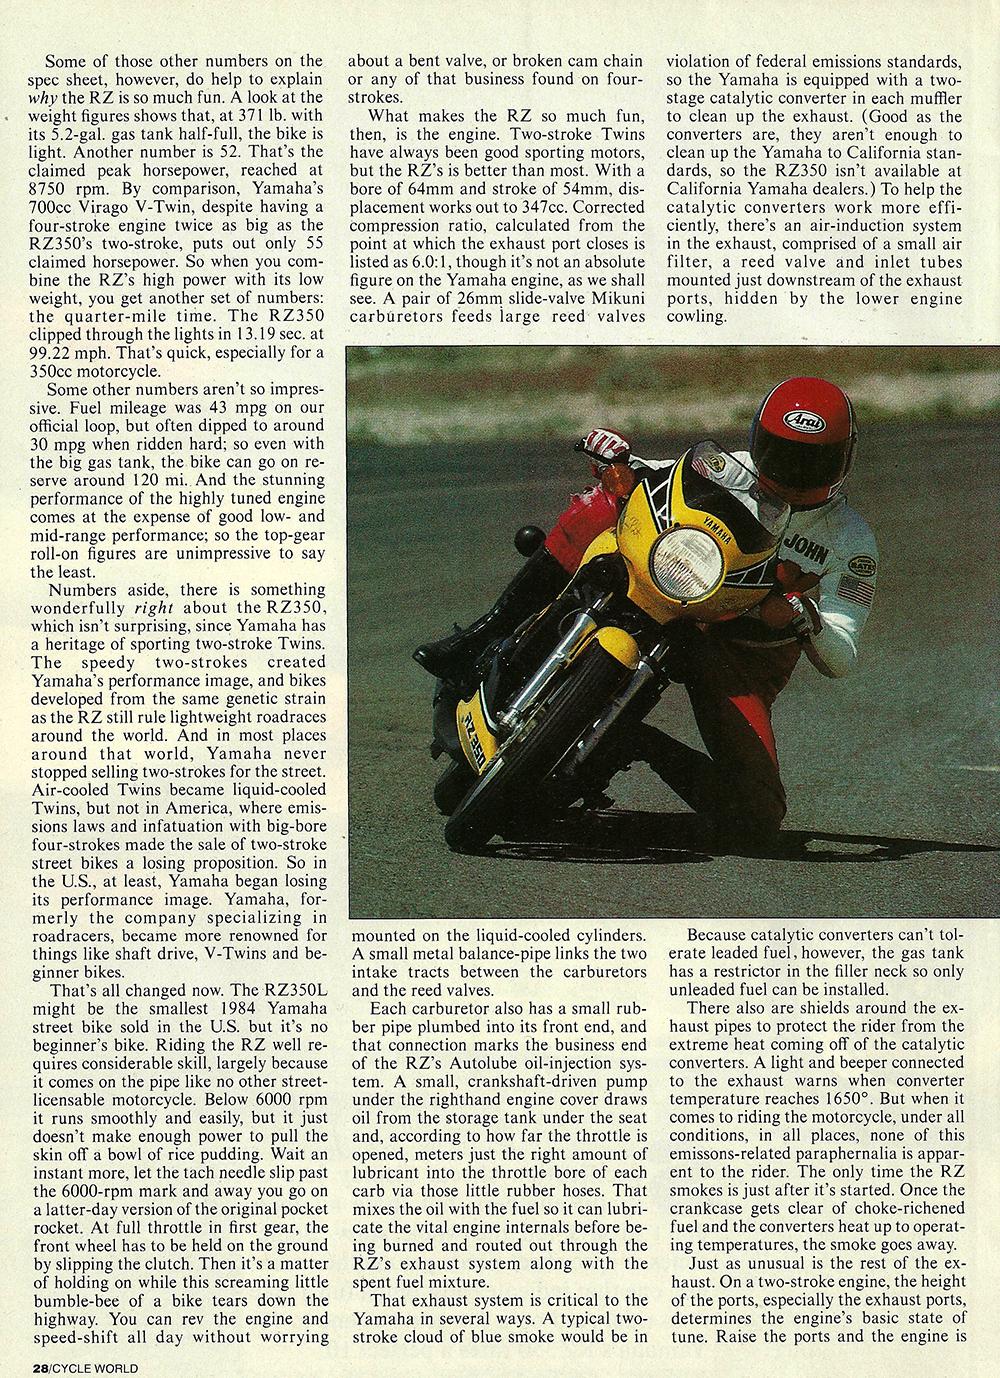 1984 Yamaha RZ350 road test 03.jpg